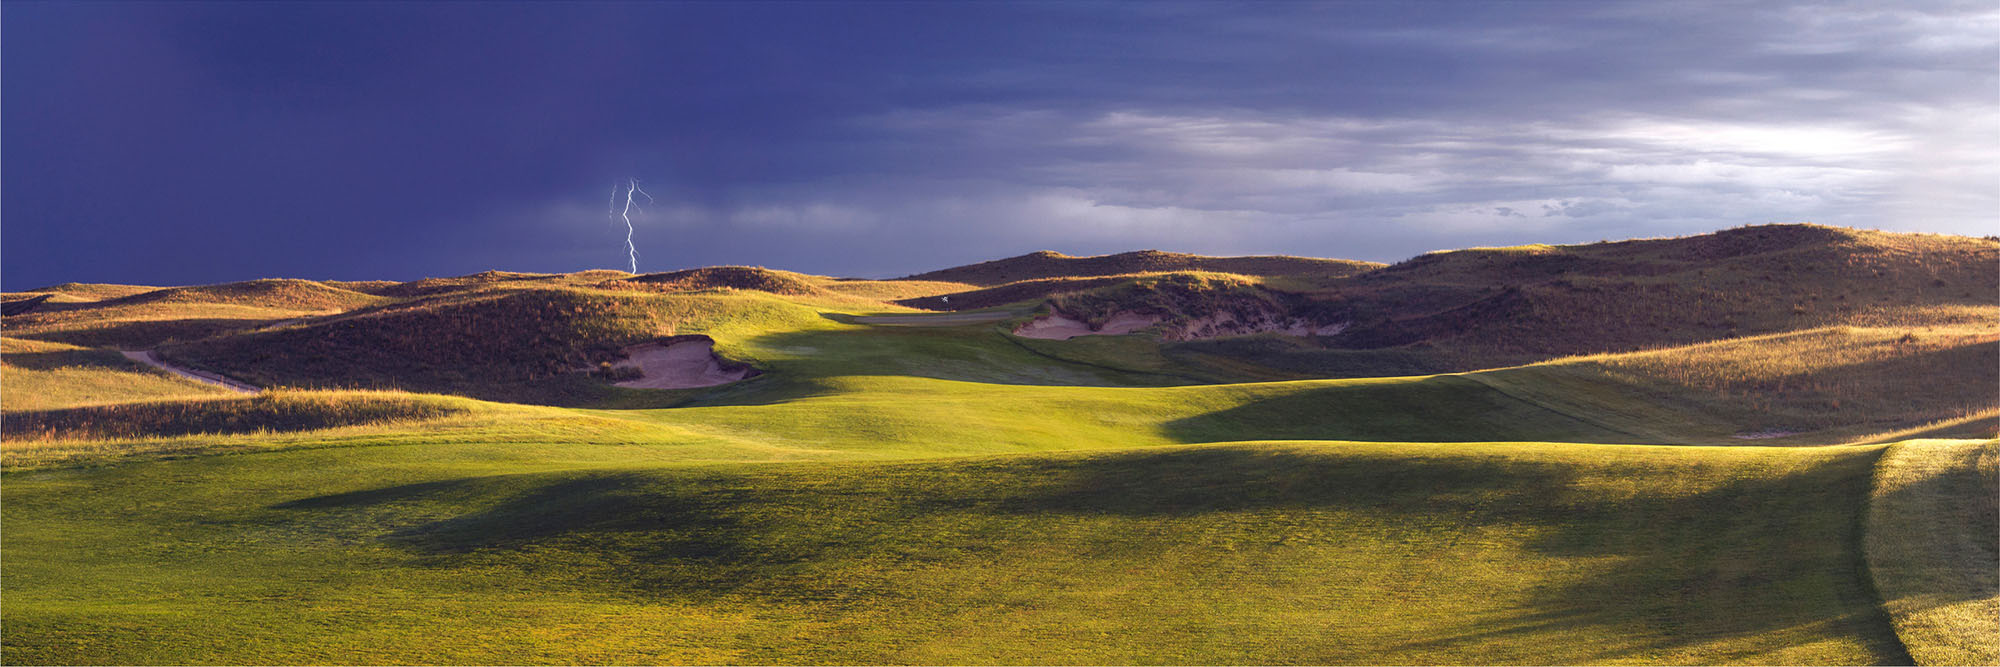 Golf Course Image - Sand Hills No. 1